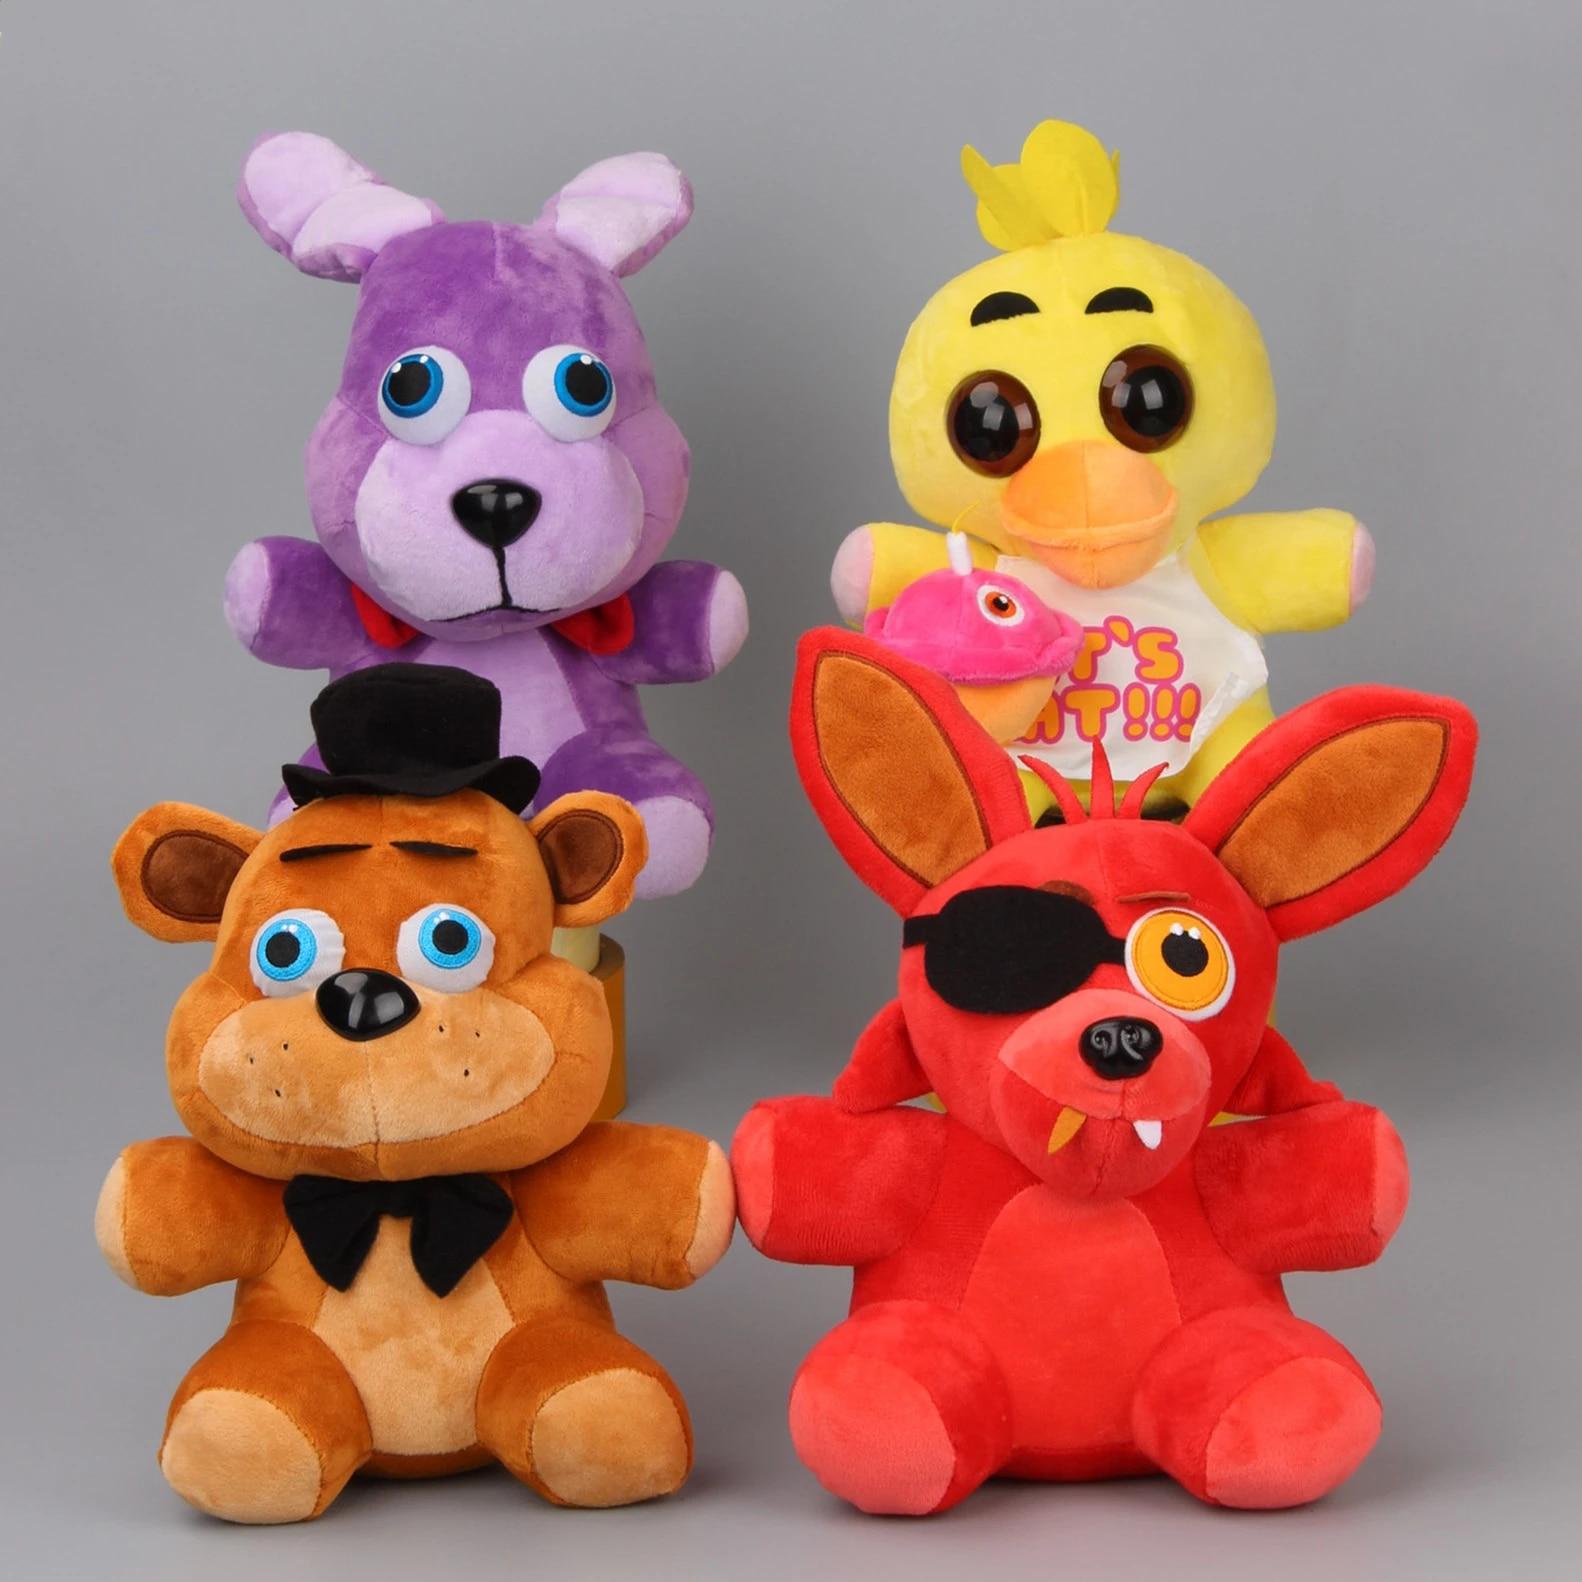 Koala Stuffed Animals Mini, 4 Pcs Set Five Nights At Freddy S 4 Fnaf Plush Toys 25cm Freddy Bear Foxy Chica Bonnie Stuffed Animals Toys Women Kids Gift Movies Tv Aliexpress